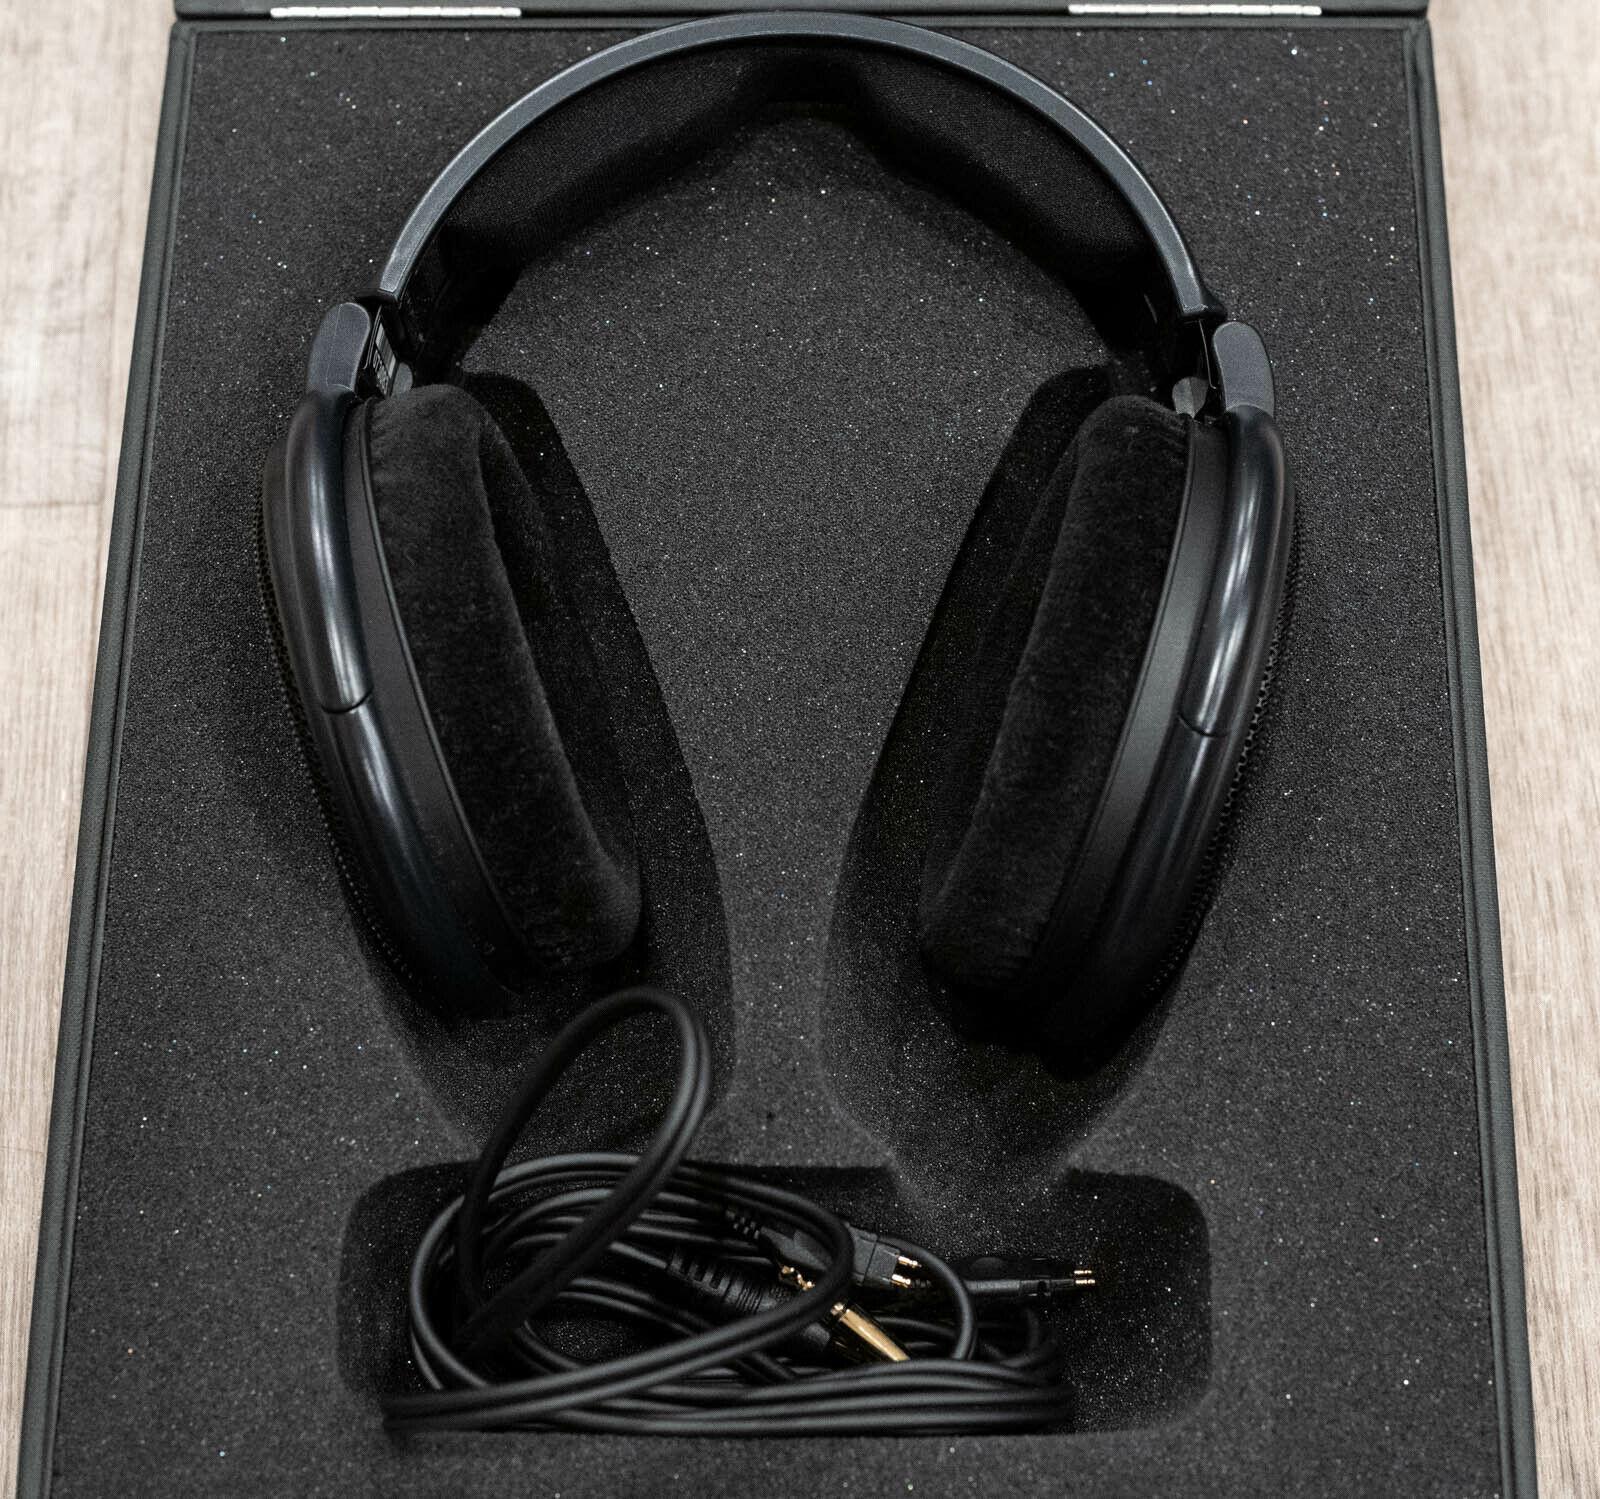 Massdrop X Sennheiser HD 6xx Reference Headphones Over The Ear Audiophile - $191.50